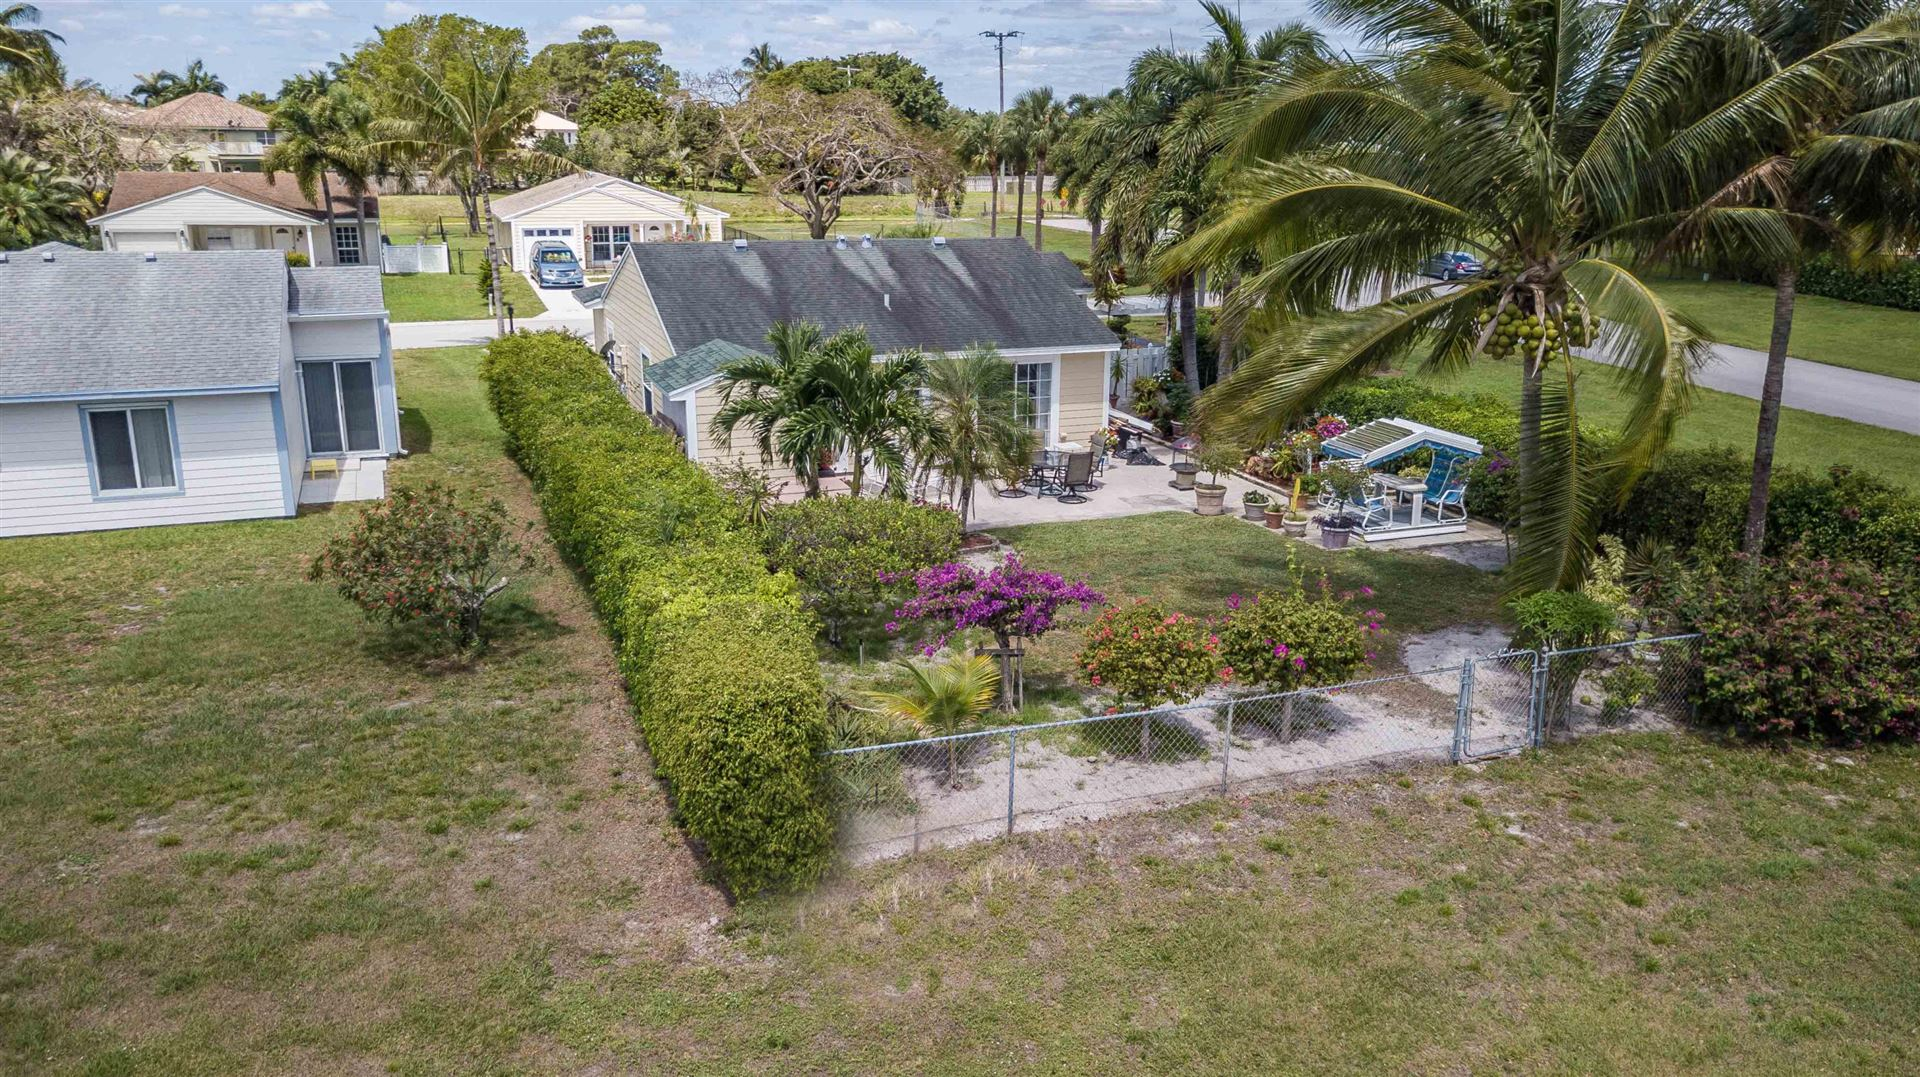 9006 Chrysanthemum Drive, Boynton Beach, FL 33472 - #: RX-10618846